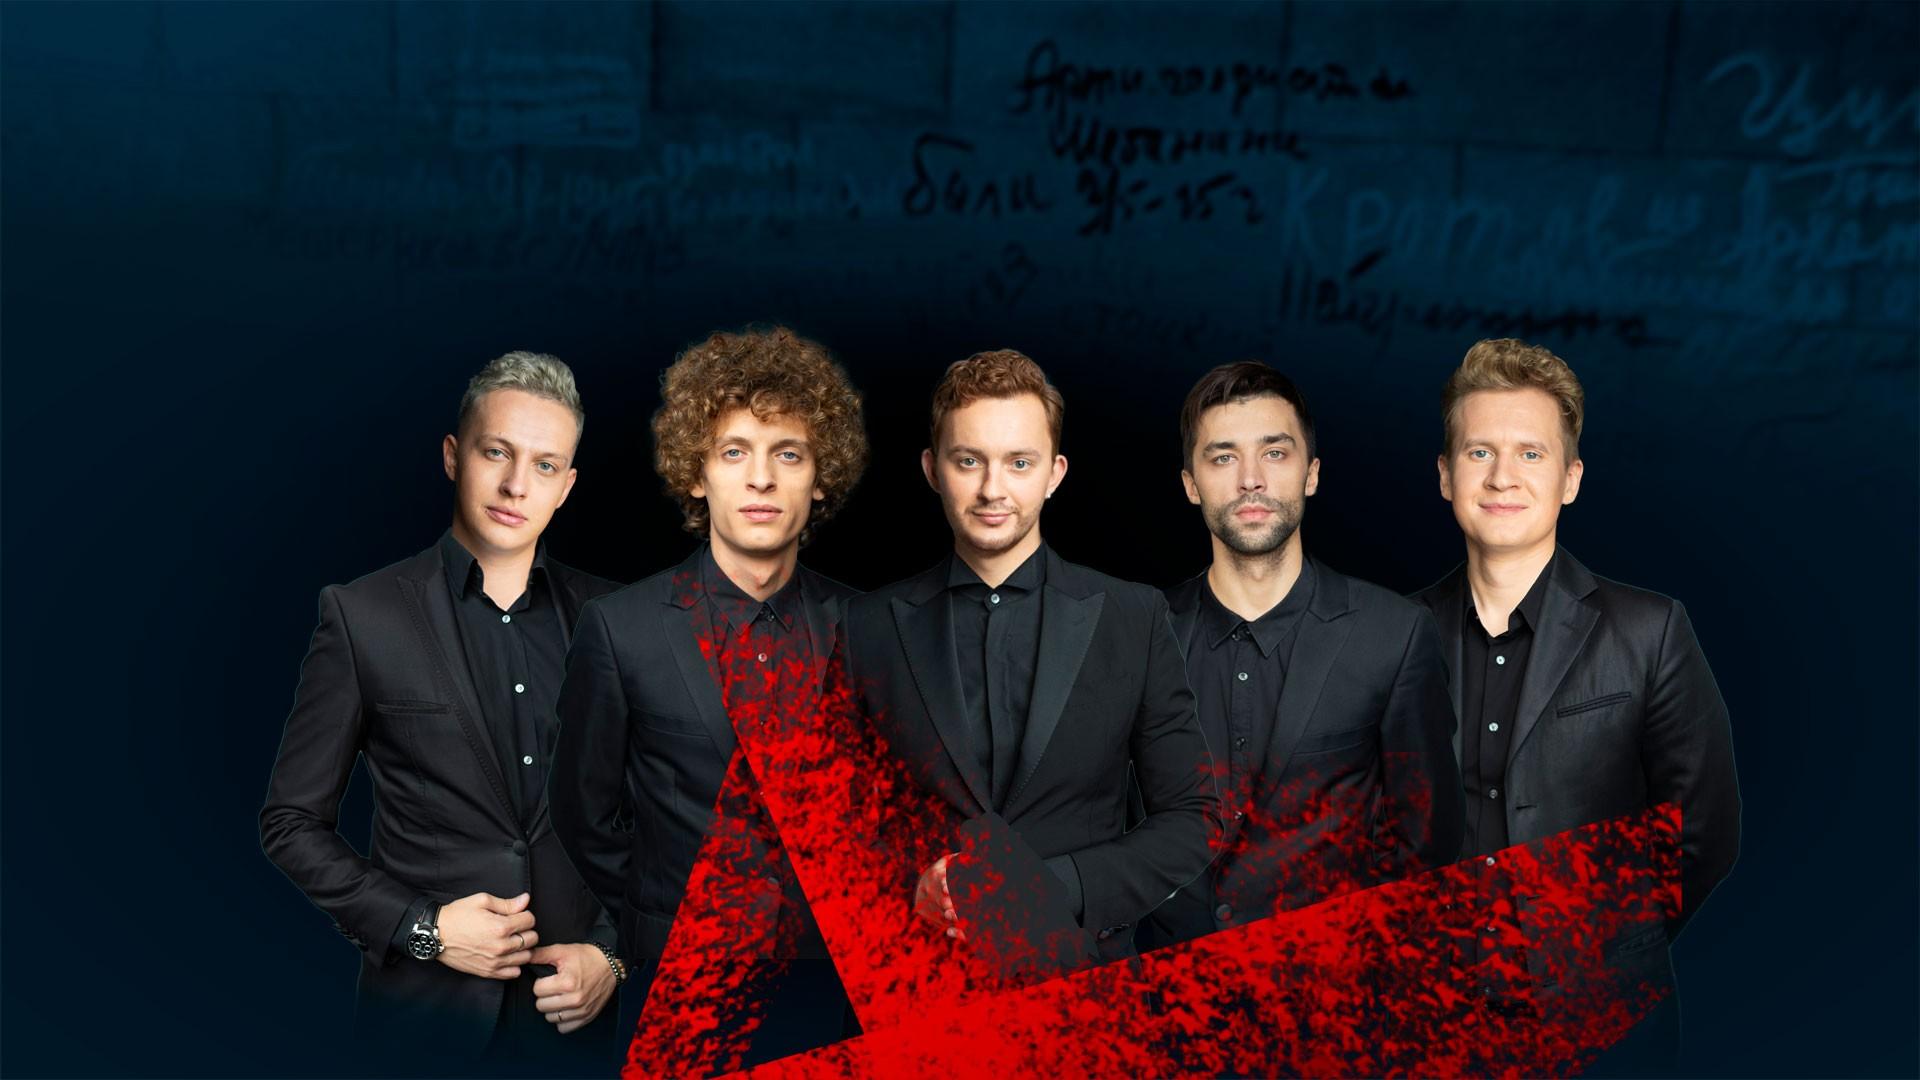 Группа «Пятеро». Концертная программа «Родина моя, моя Россия»